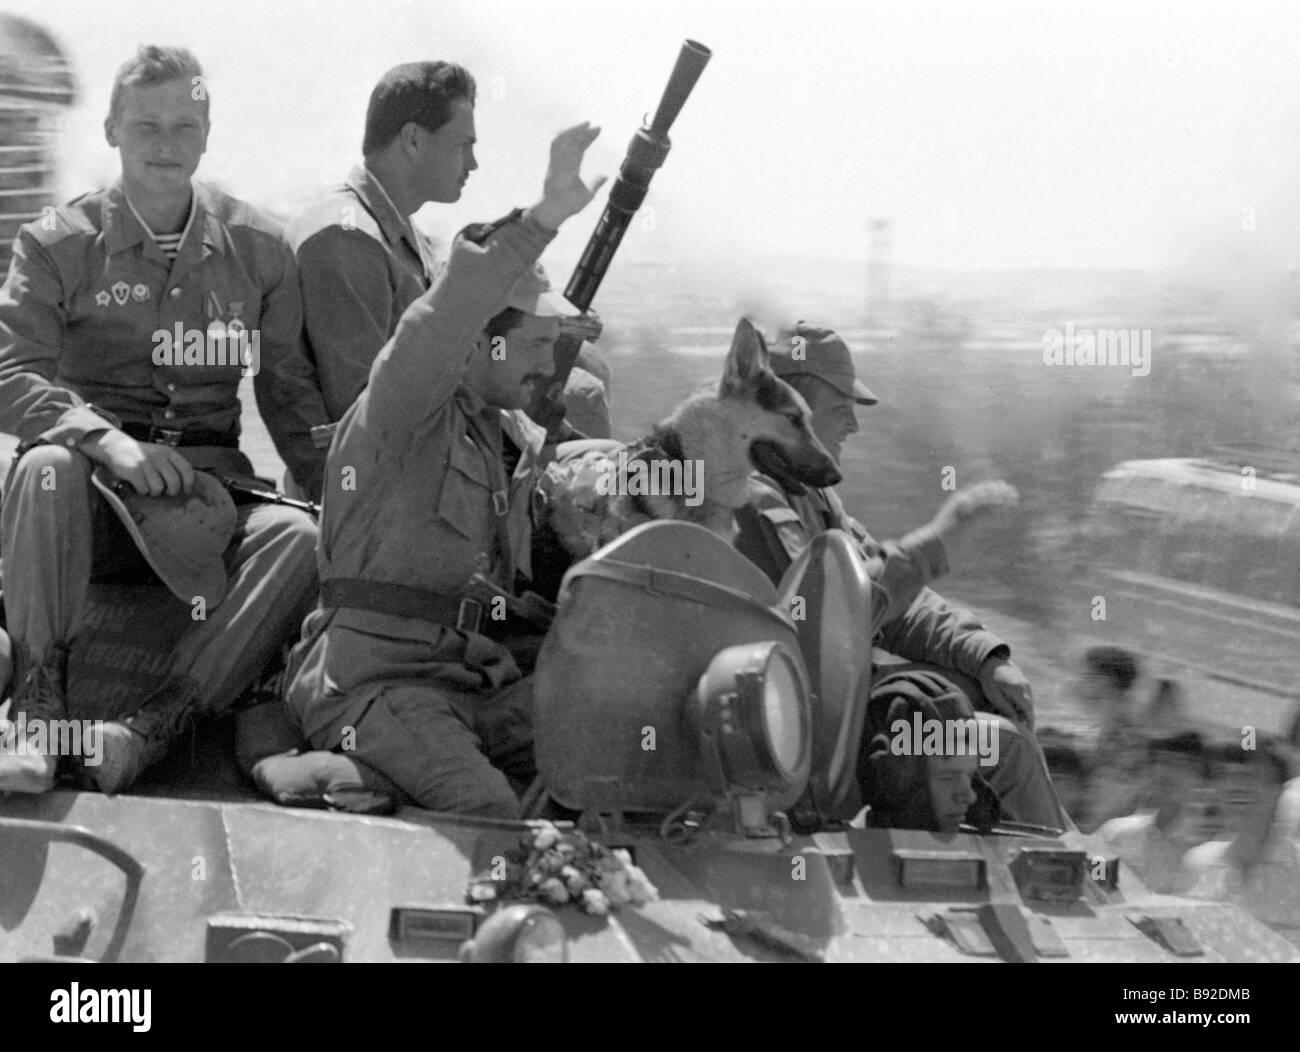 Soviet Afghanistan war - Page 6 Soviet-soldiers-internationalists-return-home-B92DMB